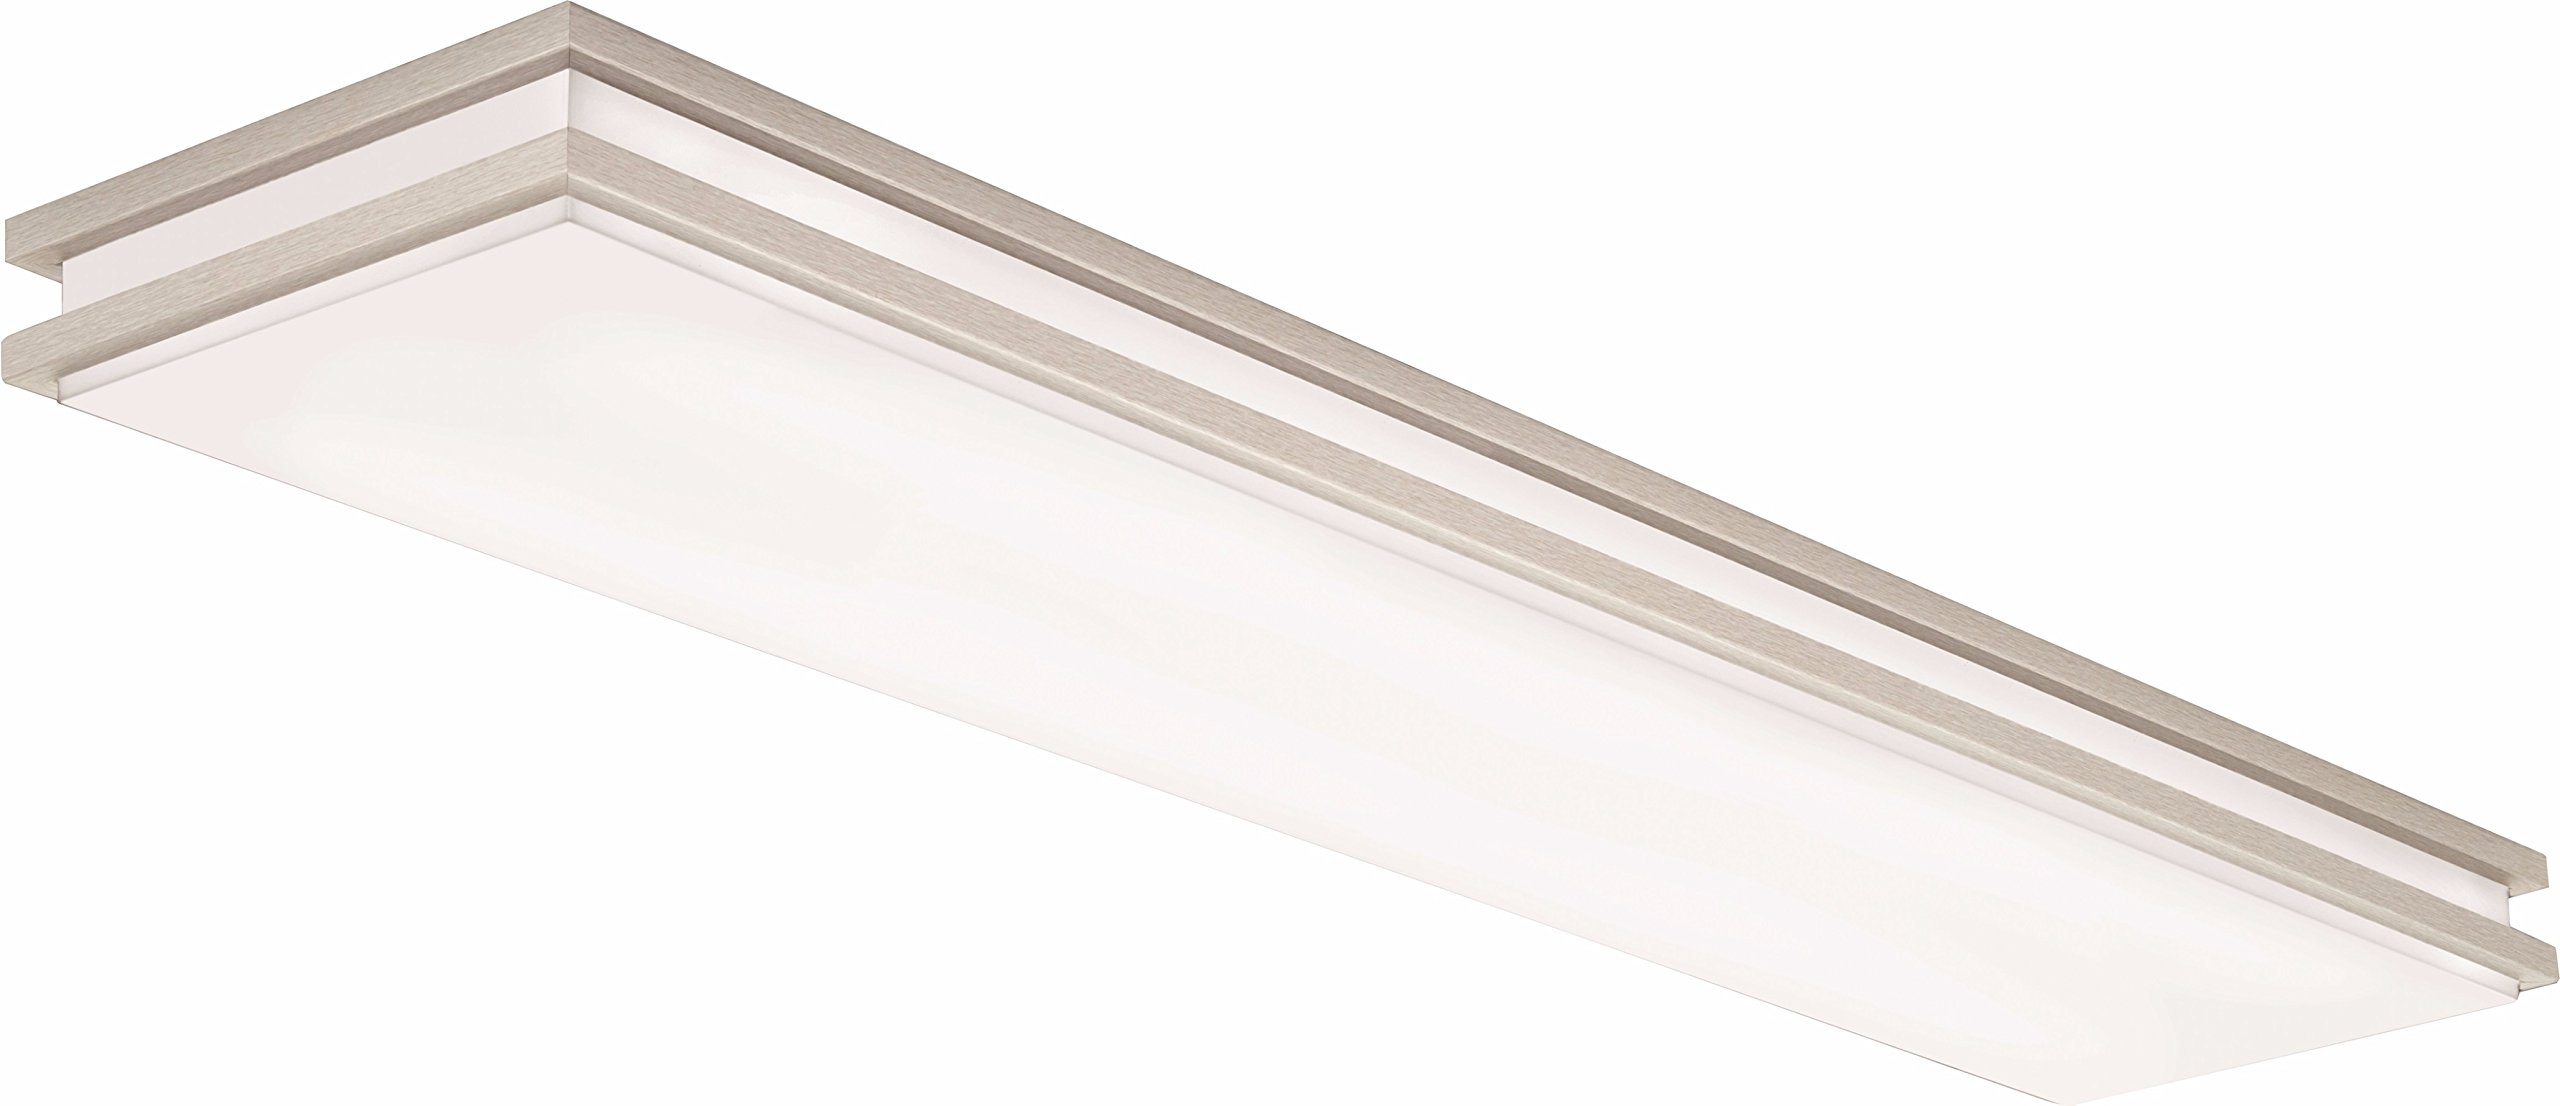 Lithonia Lighting Brushed Nickel 4-Ft LED Flush Mount, 4000K, 35.5W, 2,560 Lumens by Lithonia Lighting